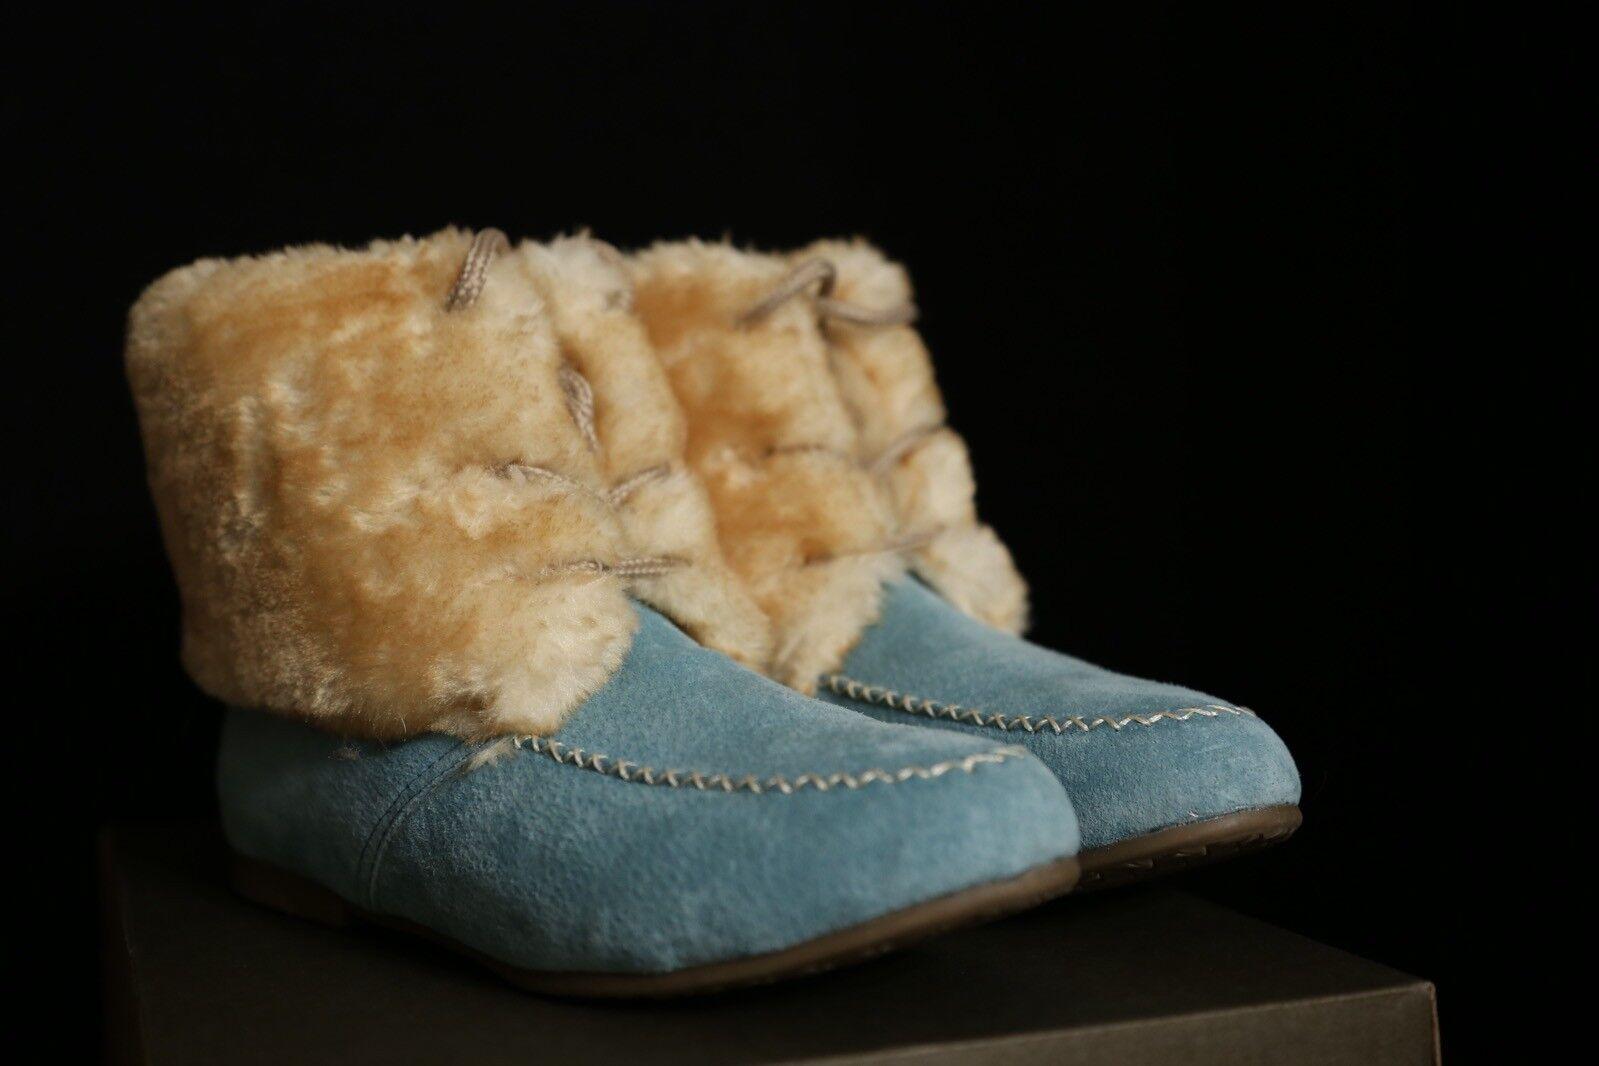 Lamb Calzado azul Suede botas w  Faux Fur Fur Fur Talla 6 NEW NIB  Vuelta de 10 dias